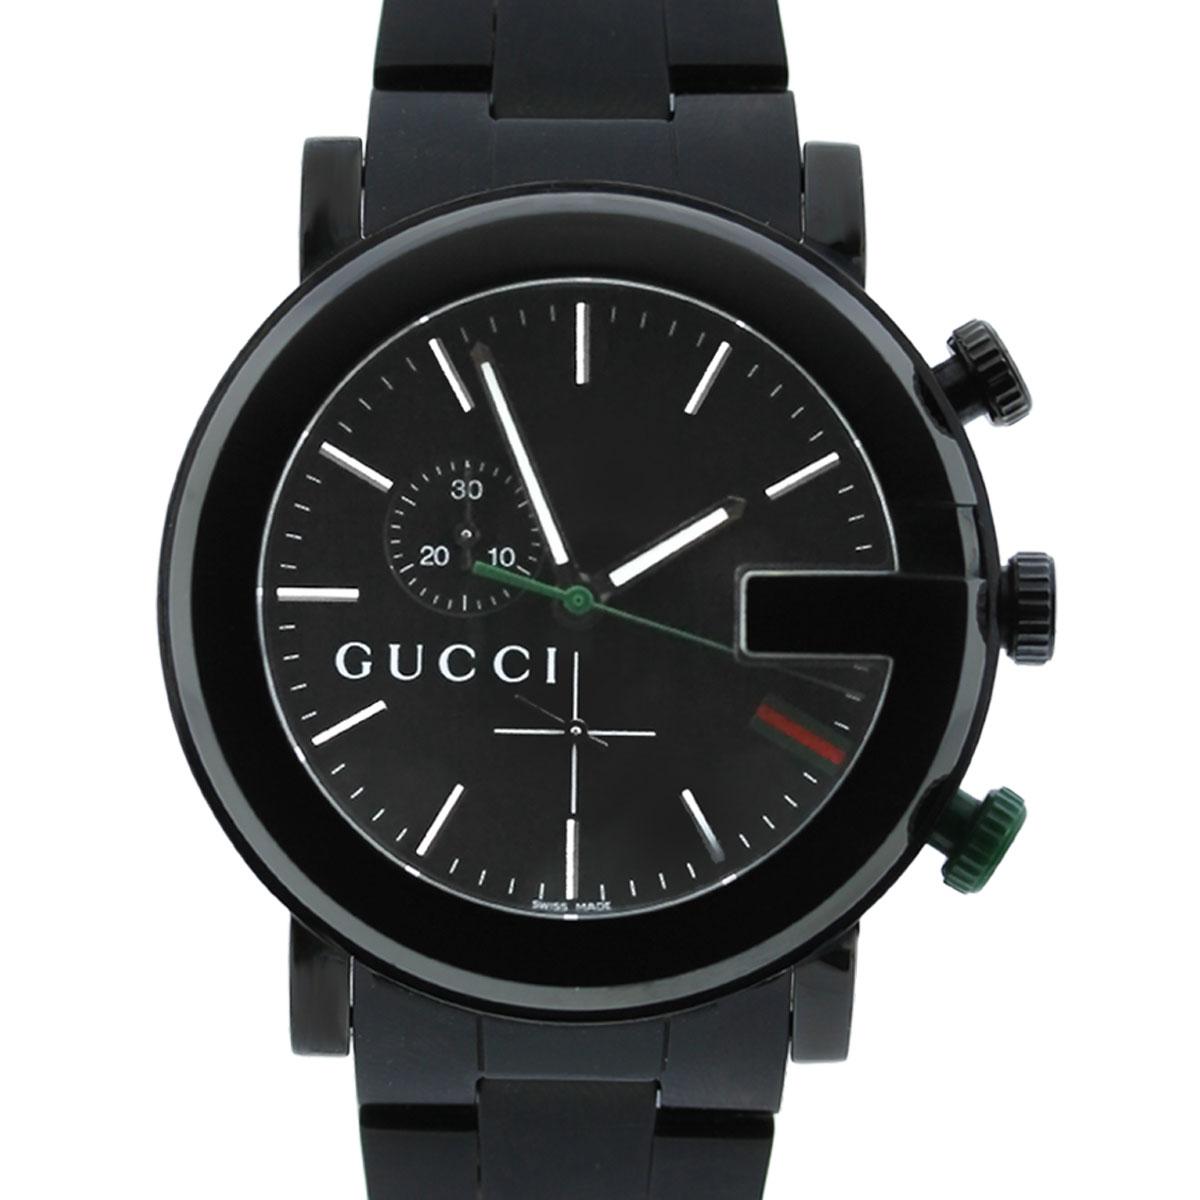 Gucci 101M Chronograph Black Dial Mens Watch  Boca Raton